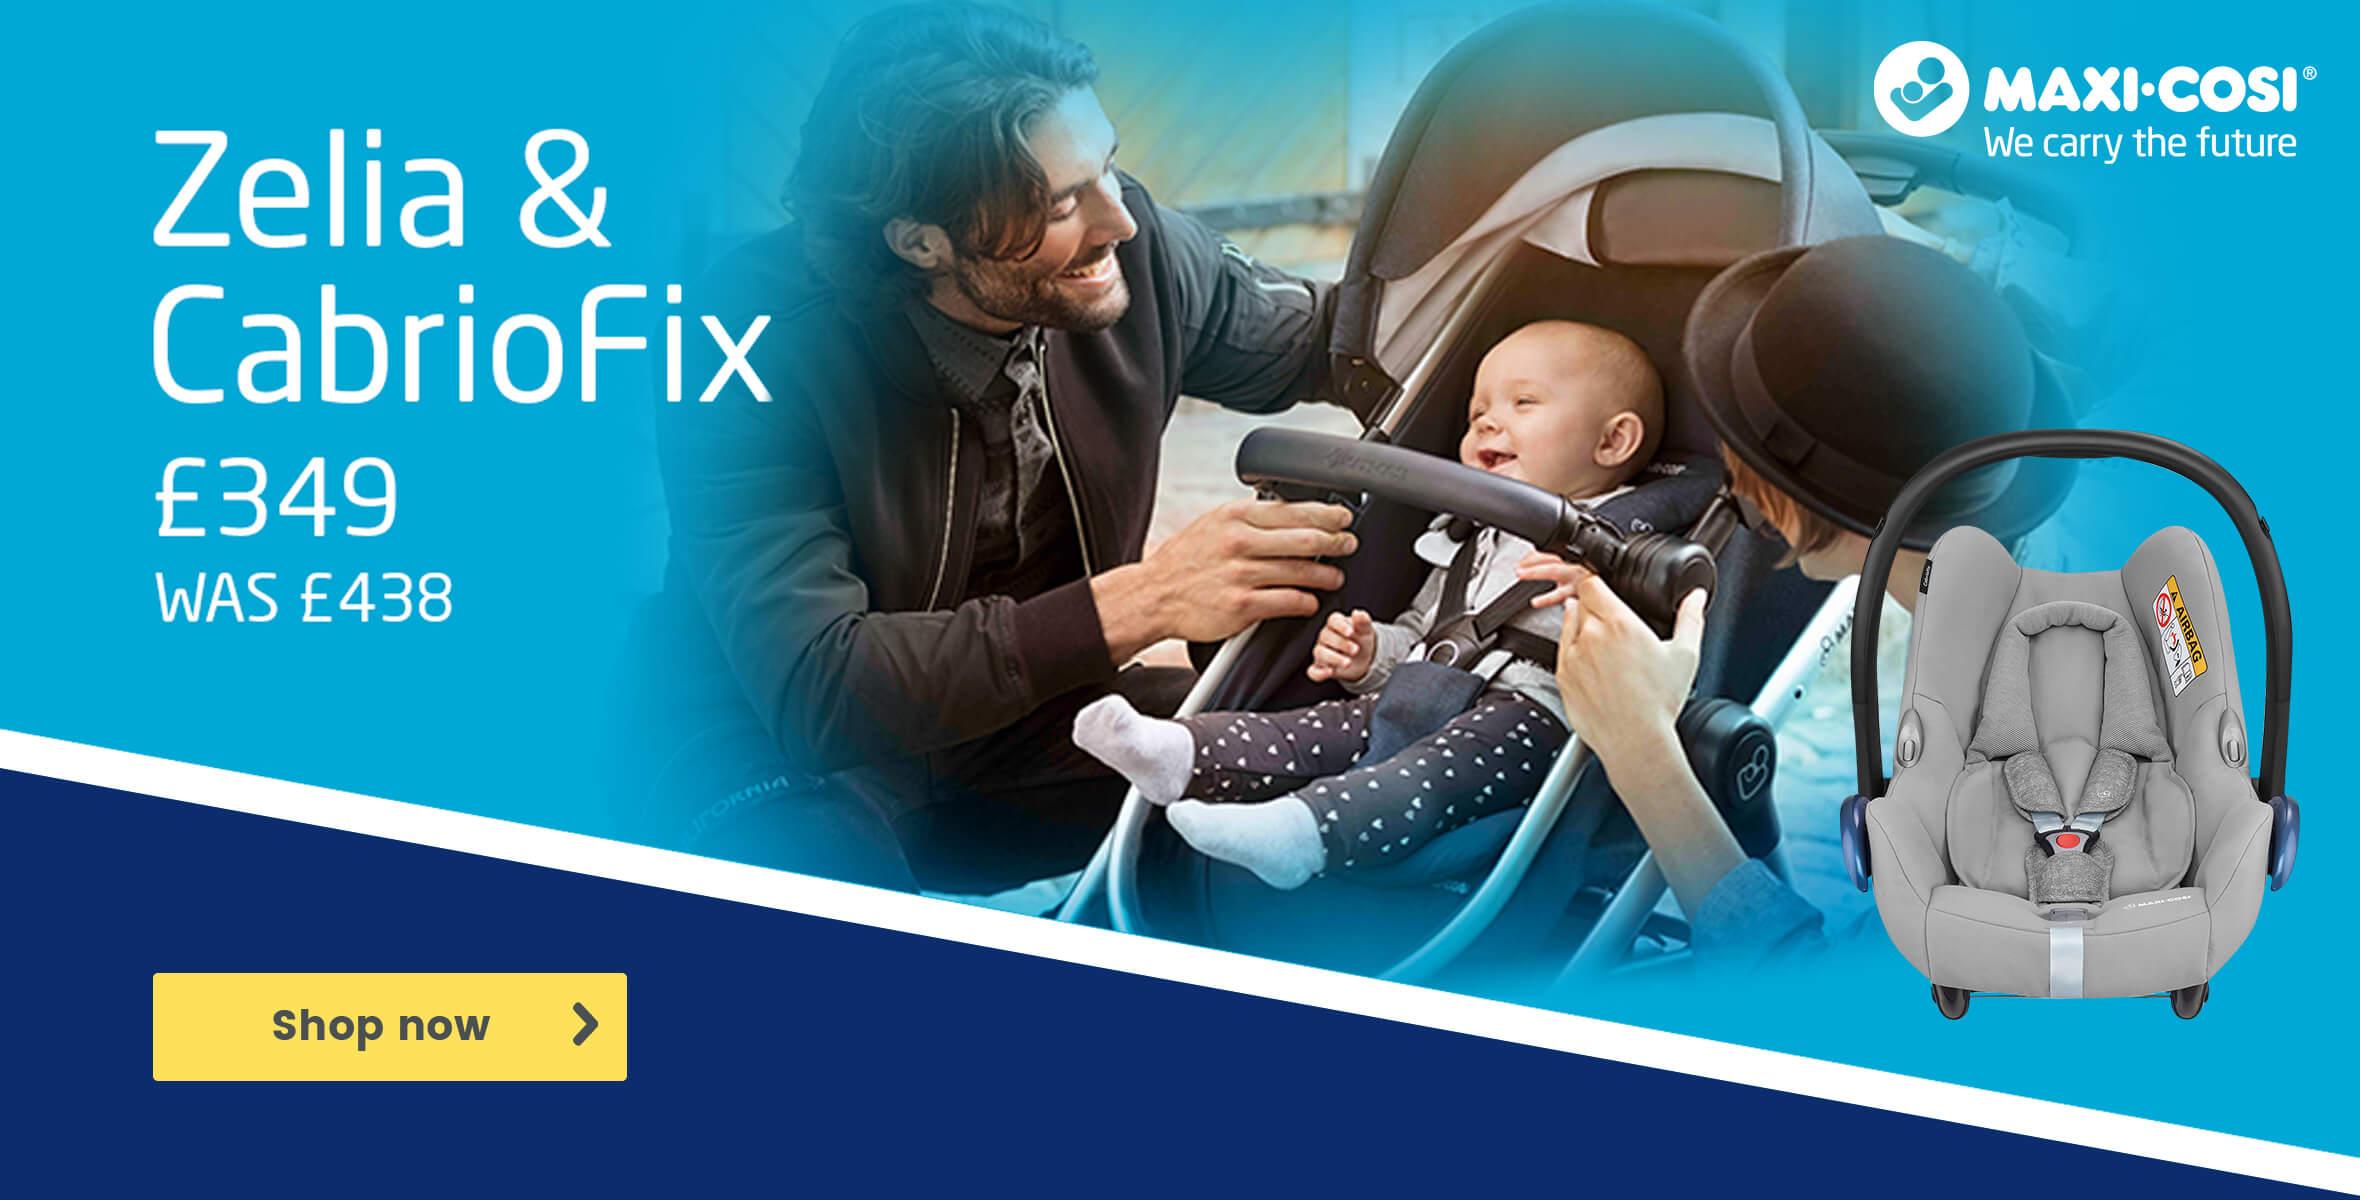 Maxi-Cosi Zelia & CabrioFix Now £349